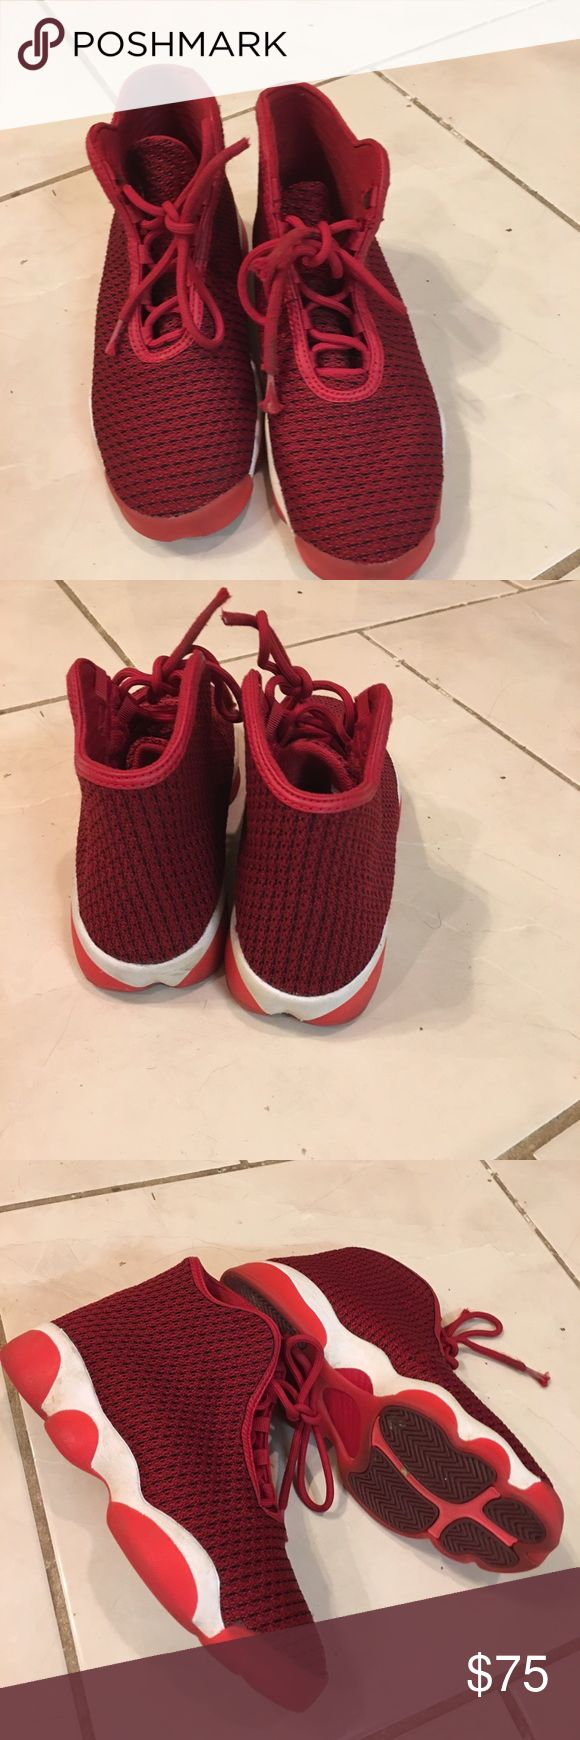 Jordan Horizon GS Gym Red/White-Team Red-Infrared Rarely worn. (823583-601) Release dates 01/13/2016  02/25/16 Jordan Shoes Sneakers